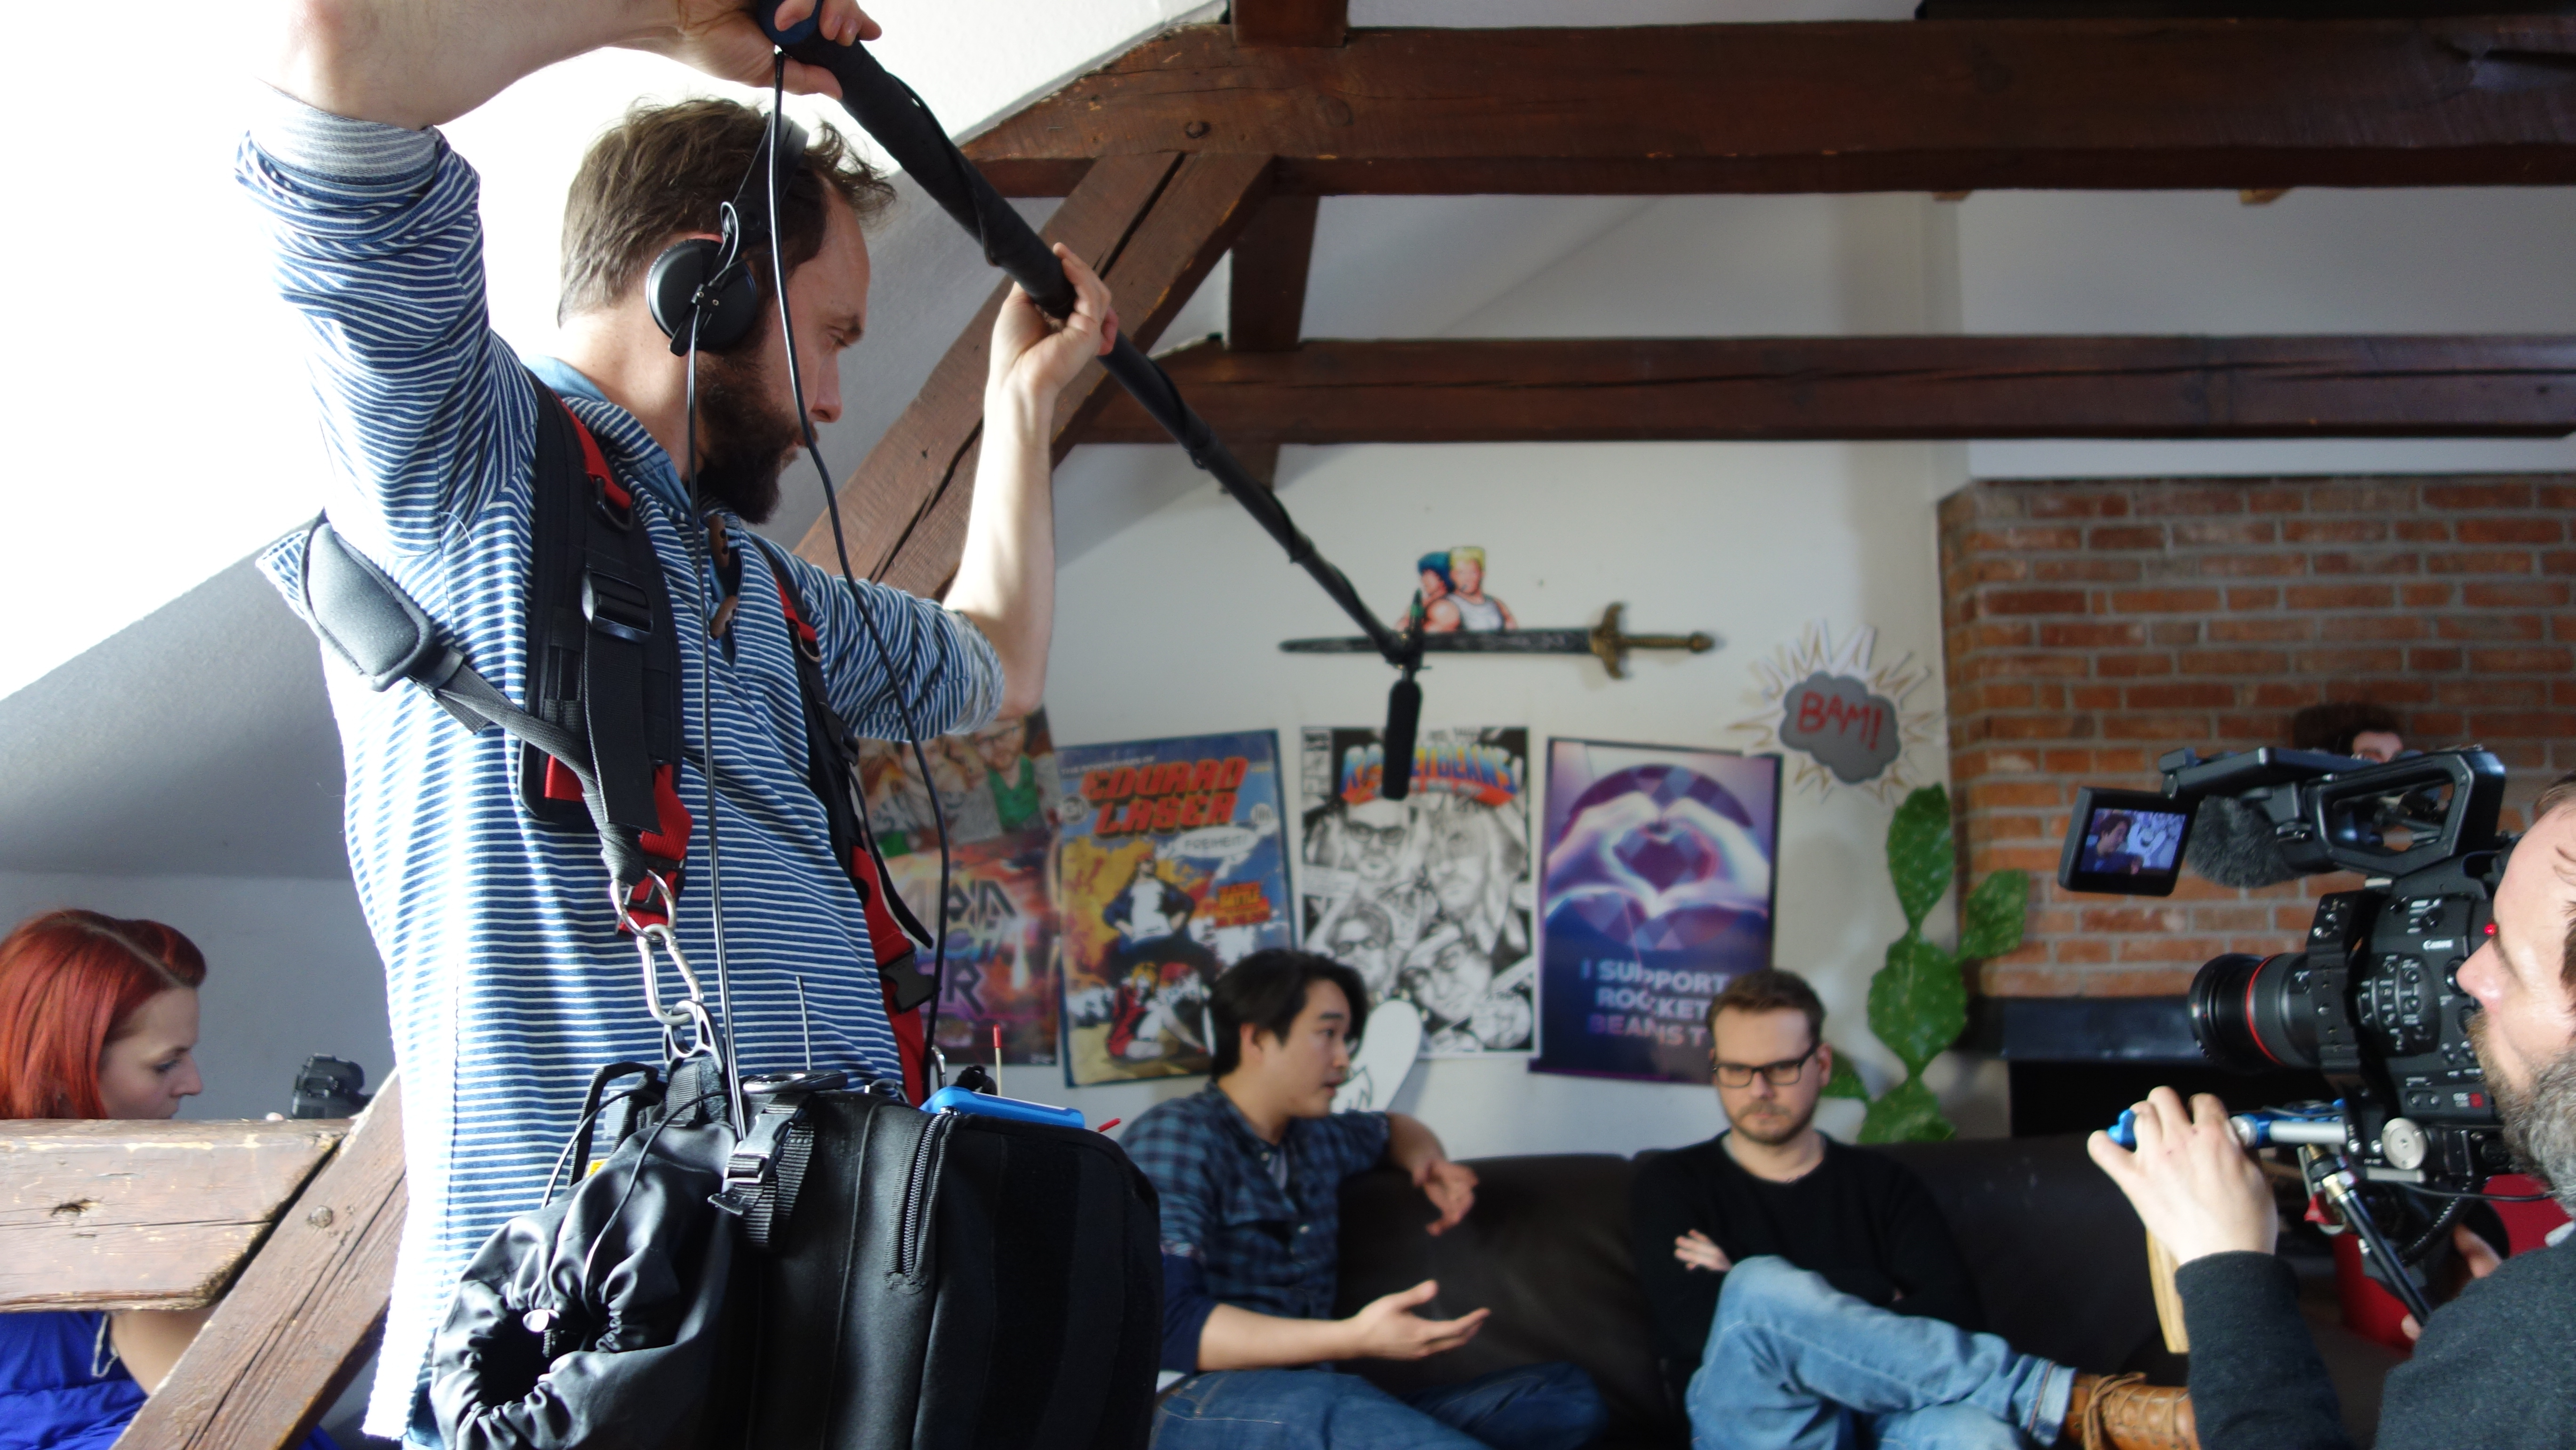 Kaminzimmer-Talk: Budi, Eddy & Sebastian